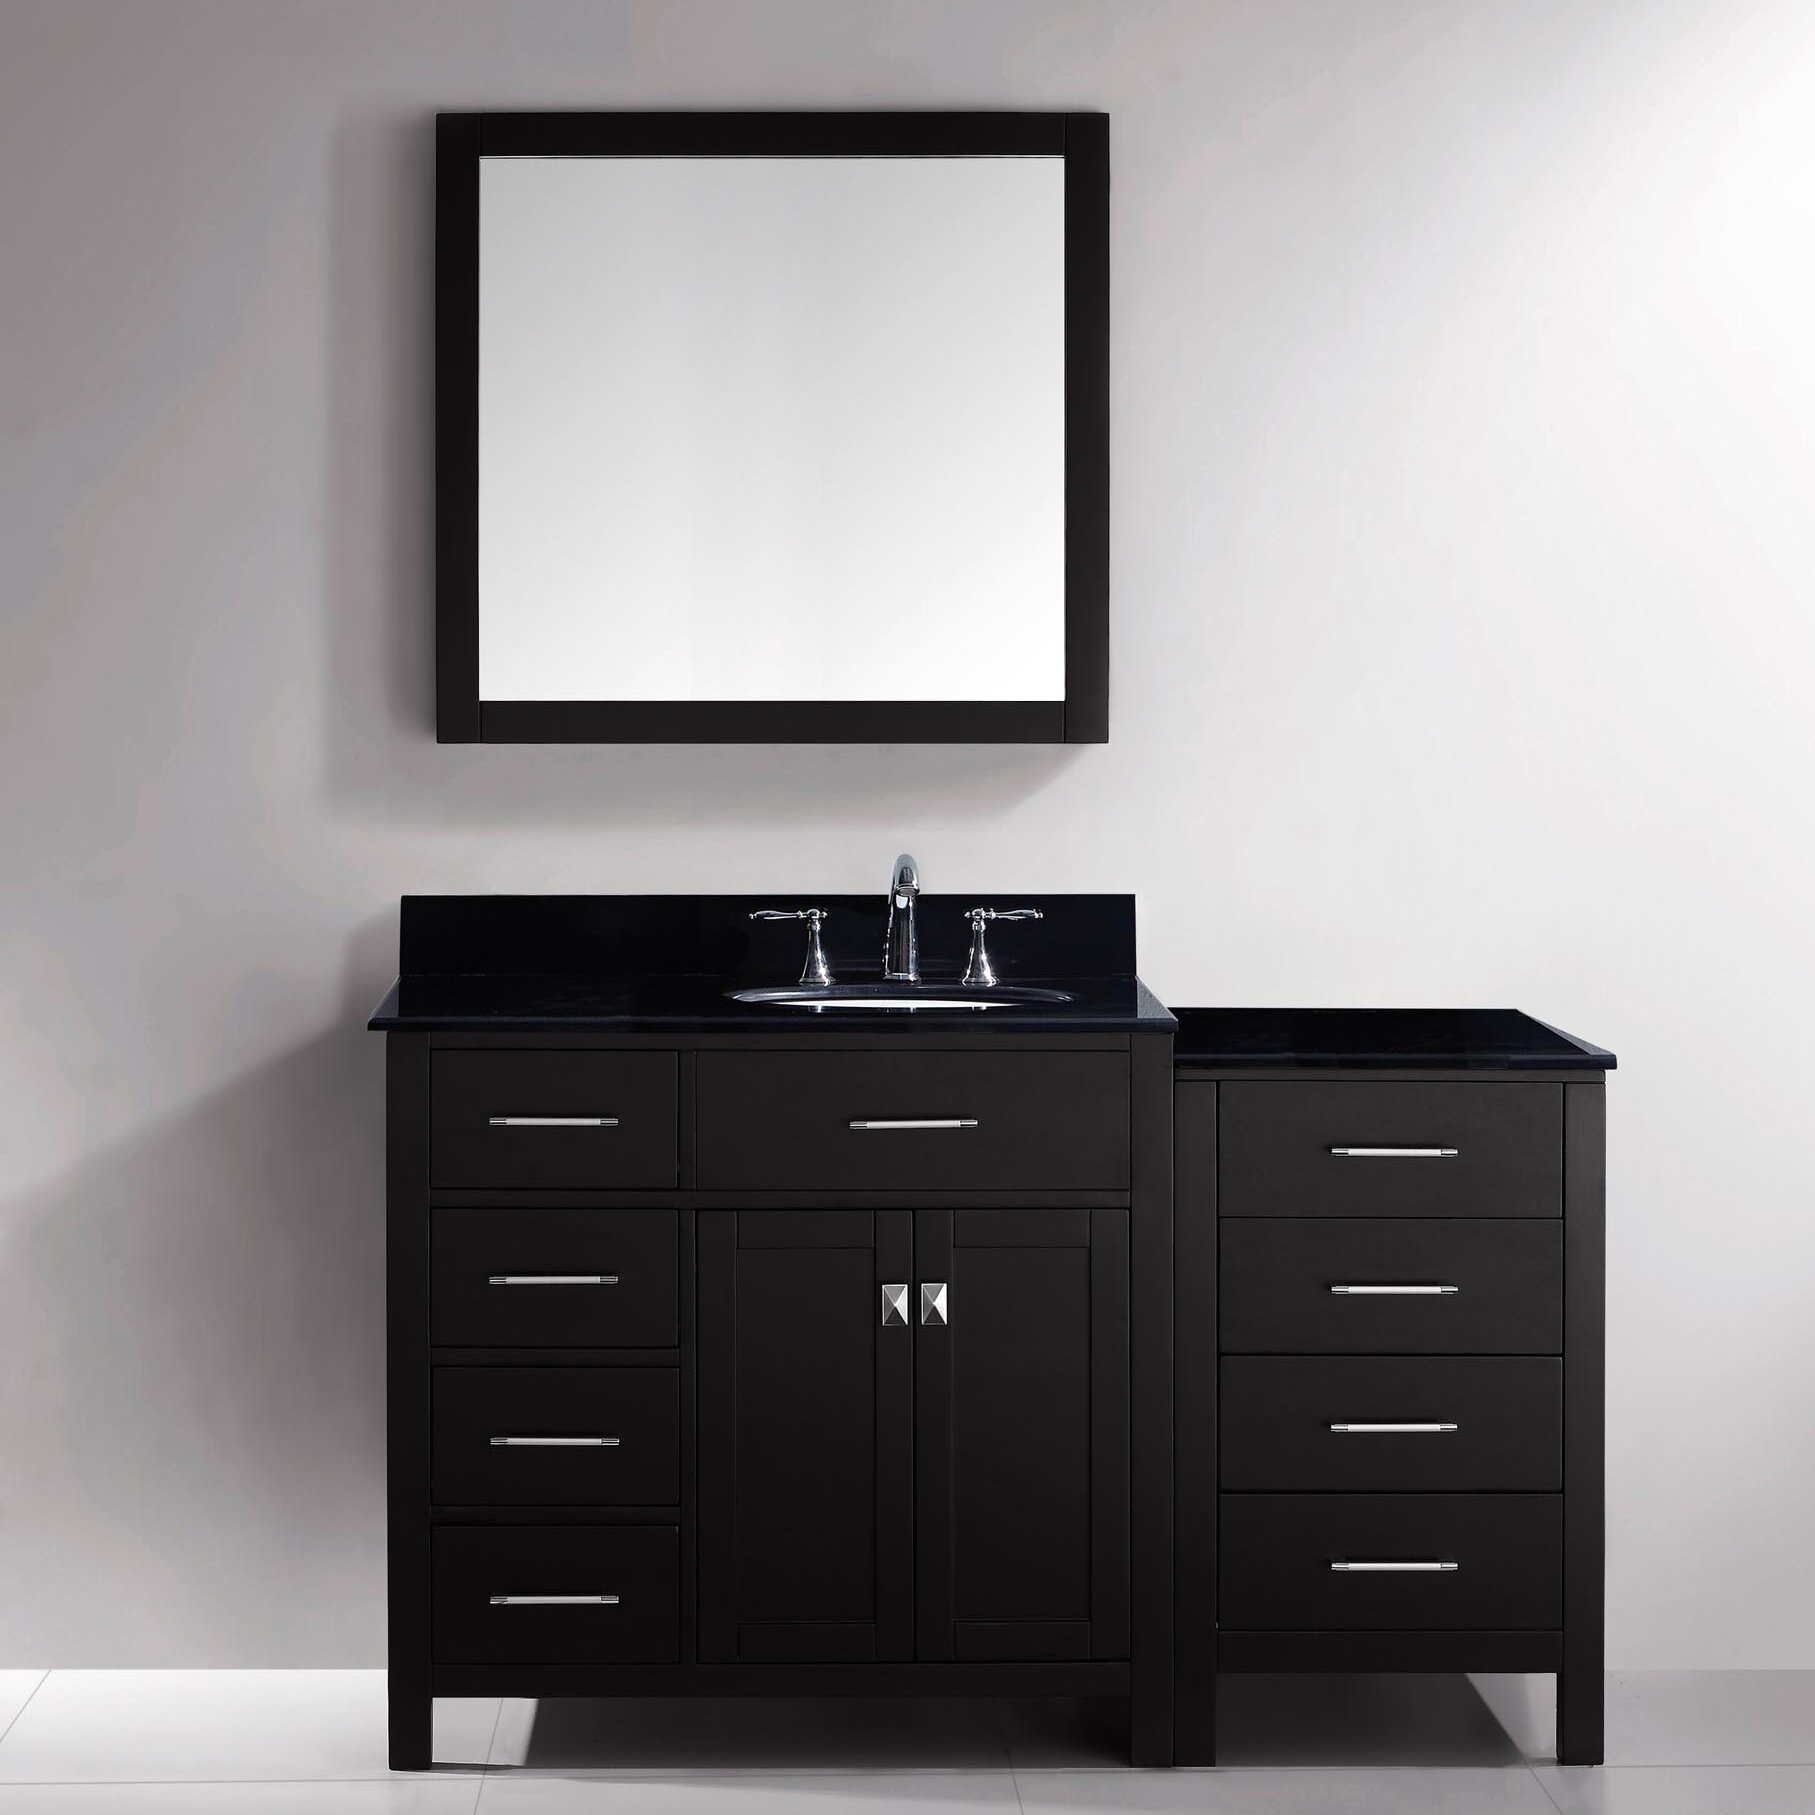 Virtu bathroom accessories - Caroline Parkway 57 Single Bathroom Vanity Set With Black Galaxy Top And Mirror